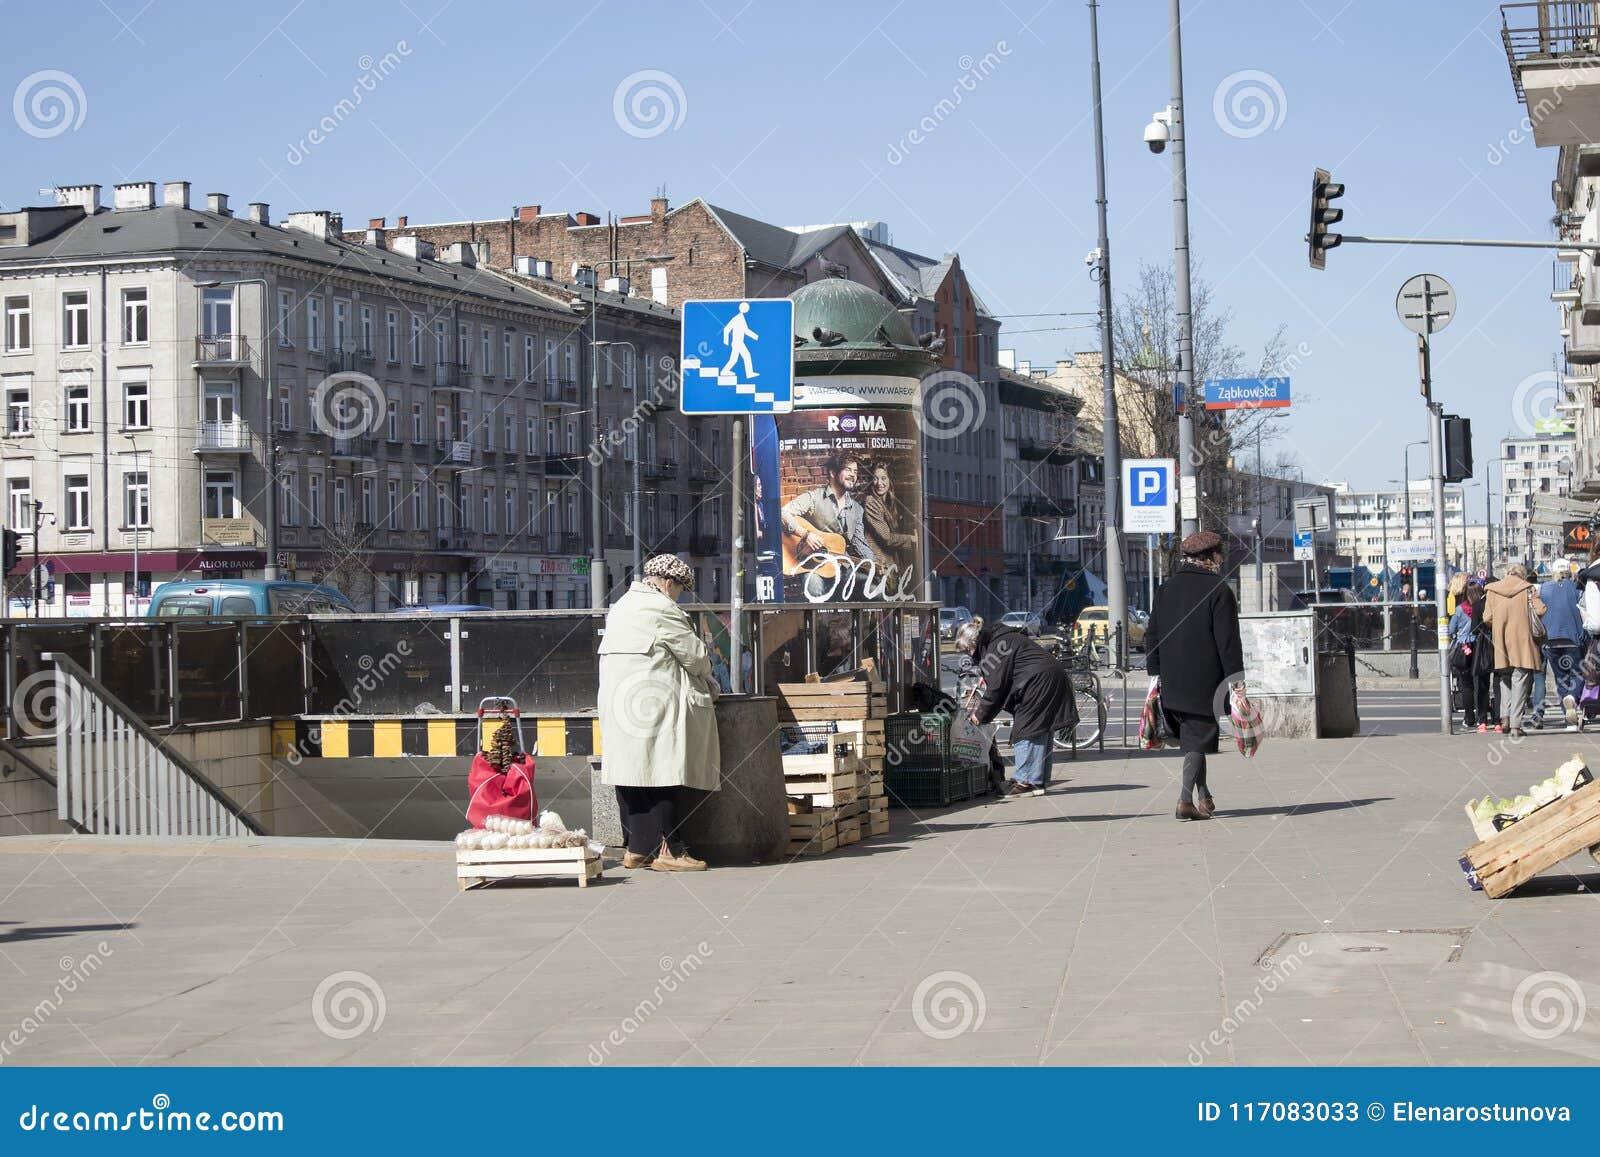 Street Vendors Sell Fruit Near The Underground Passage In